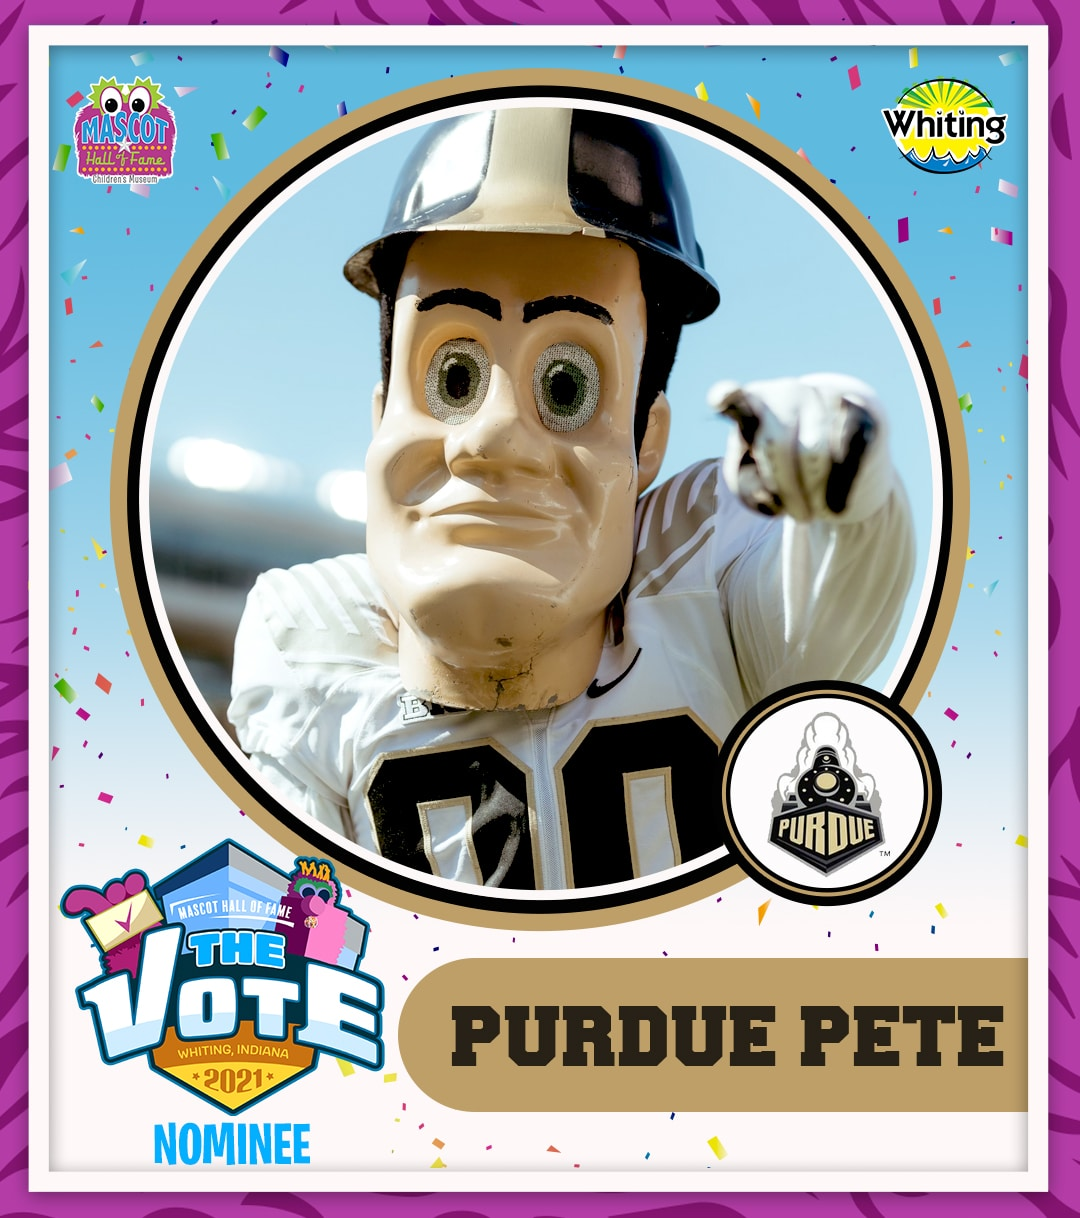 Purdue Pete photo